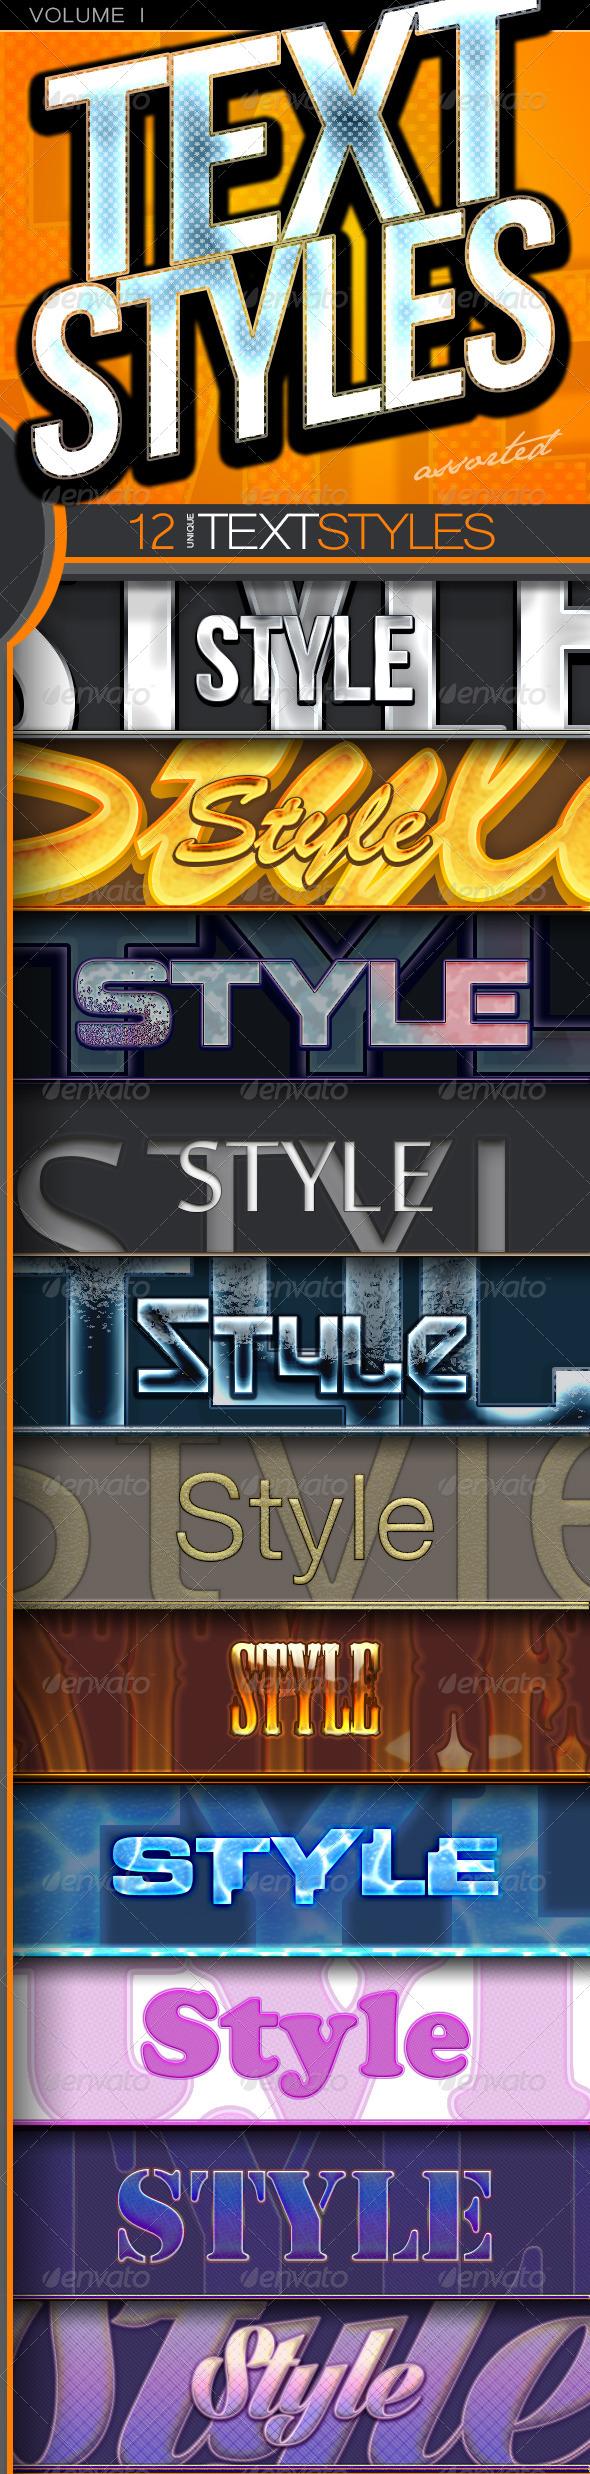 GraphicRiver C12 Text Styles Volume 1 5471435